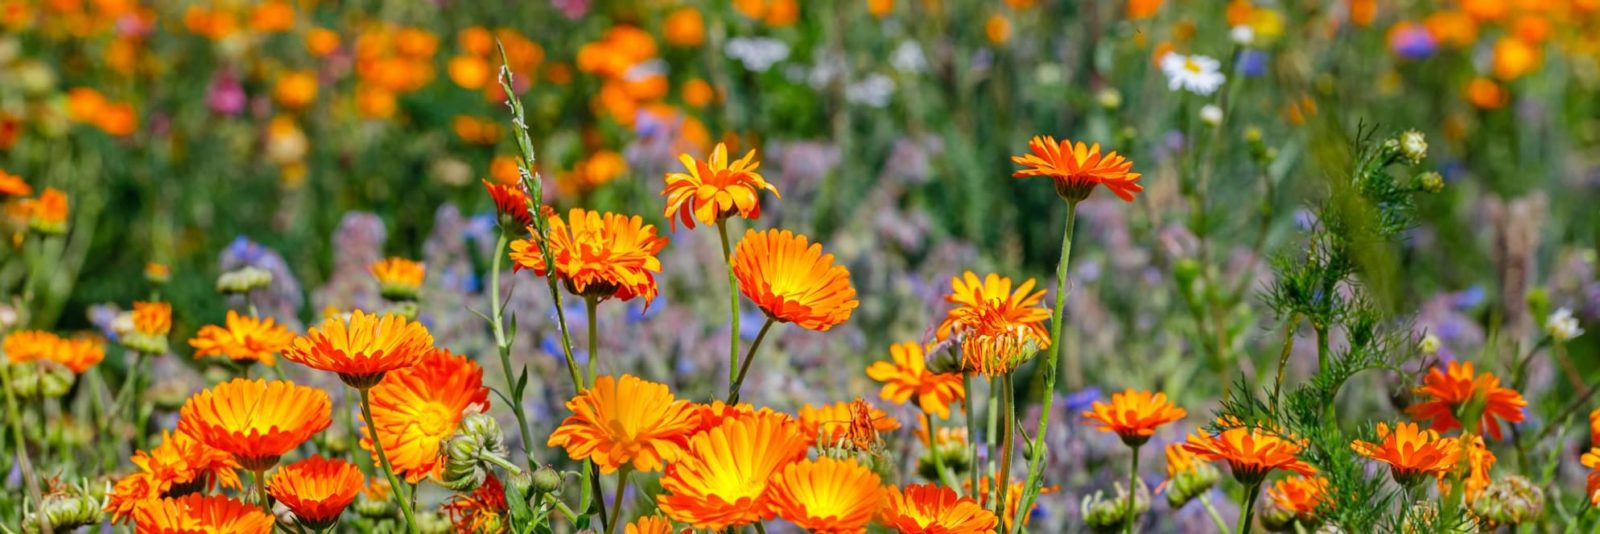 beautiful bright orange calendula flowers growing in a garden space